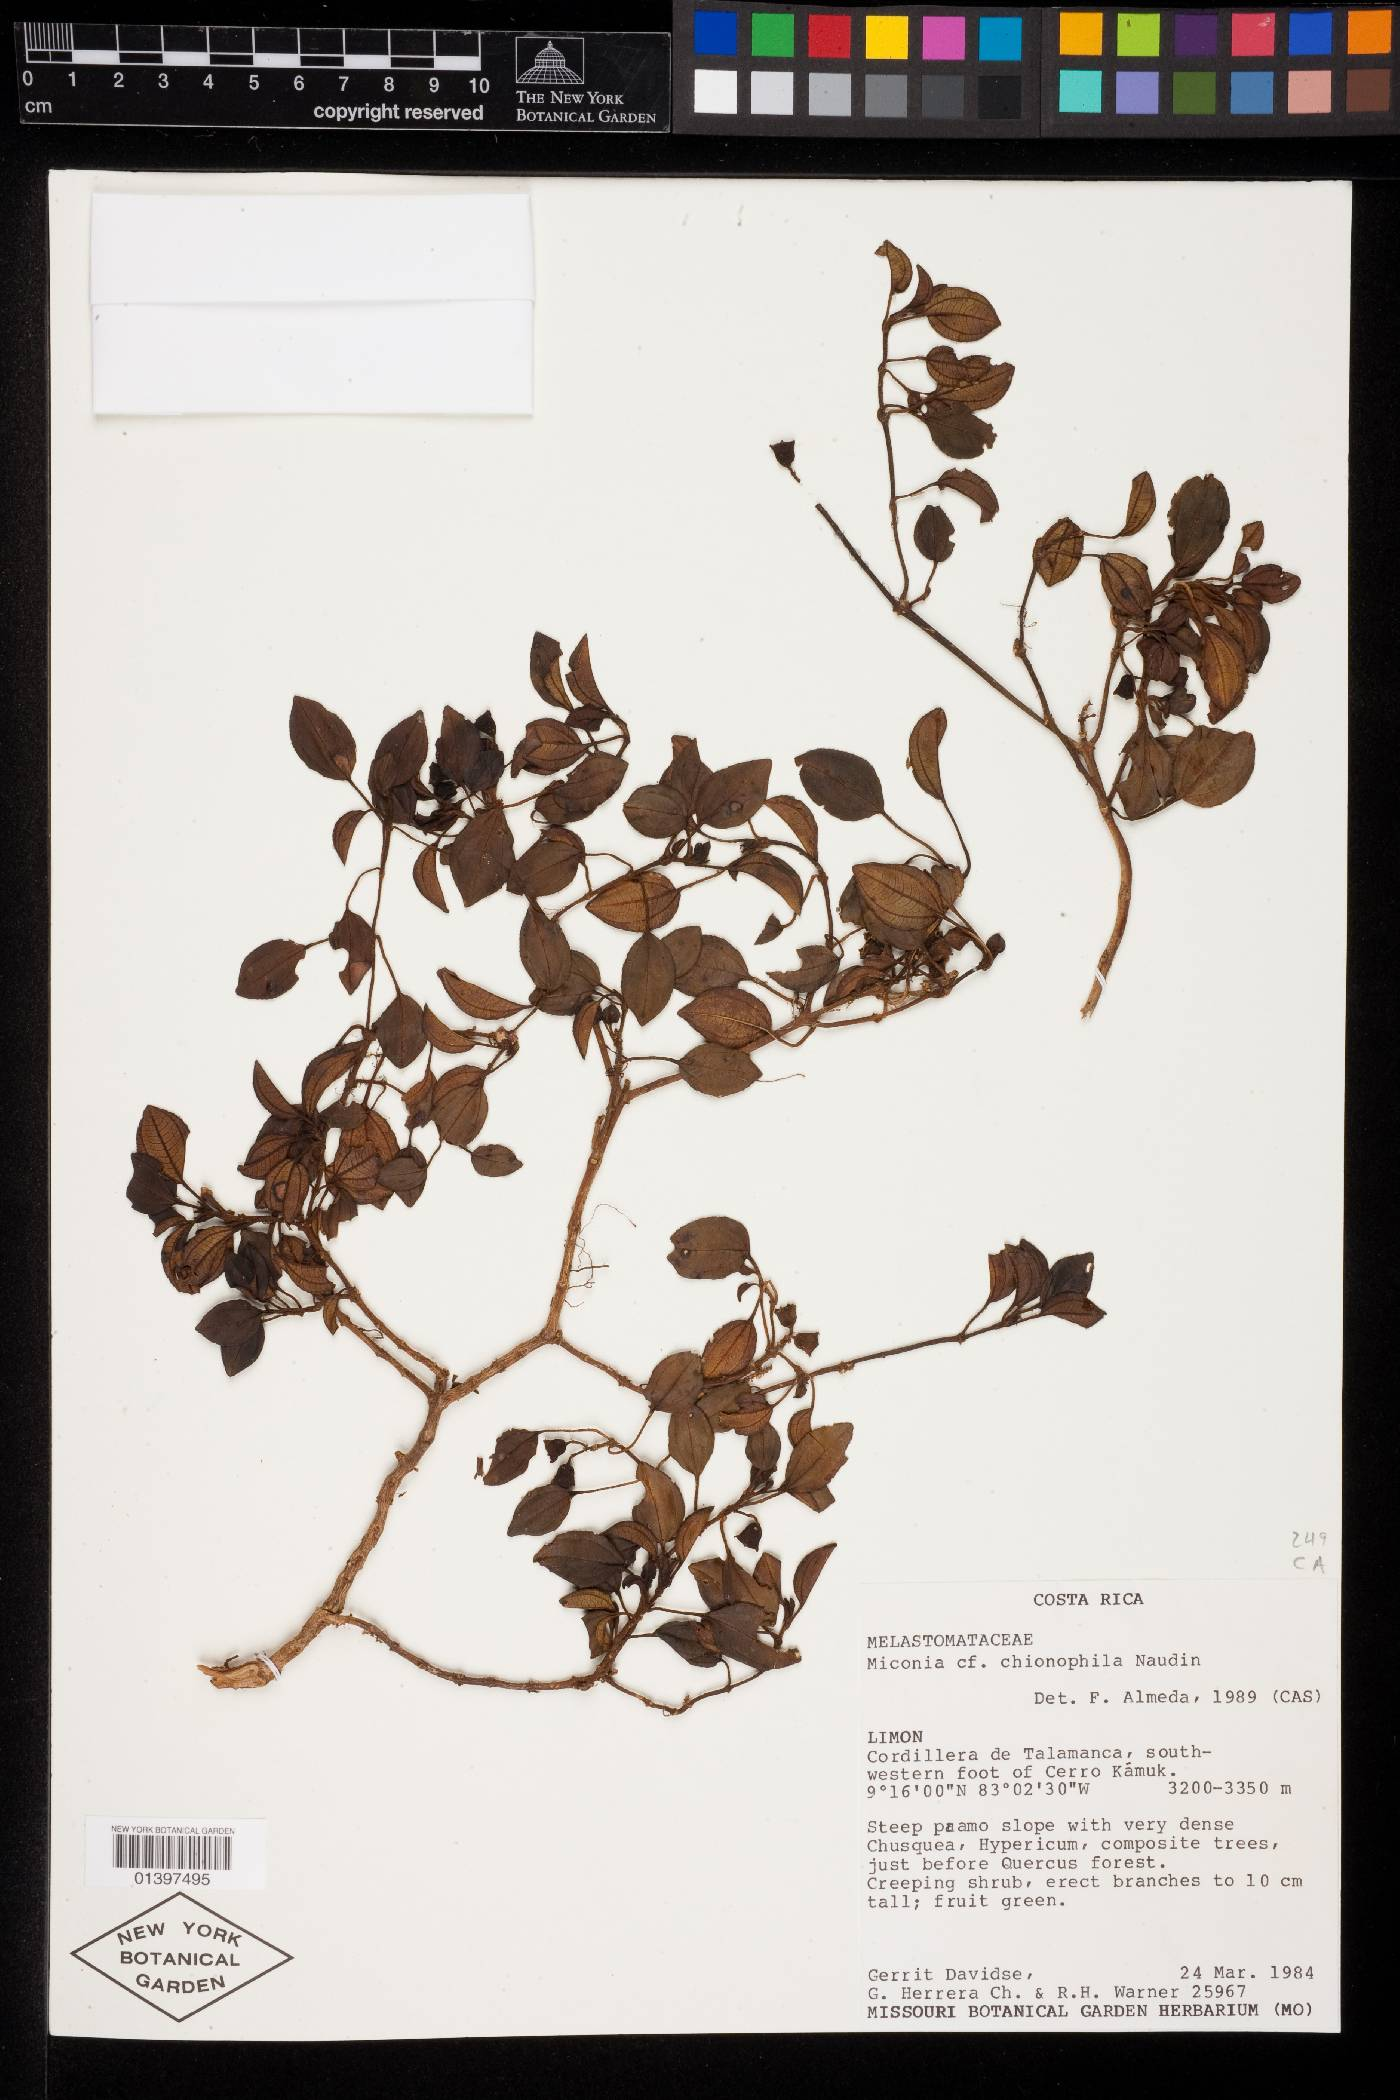 Miconia chionophila image